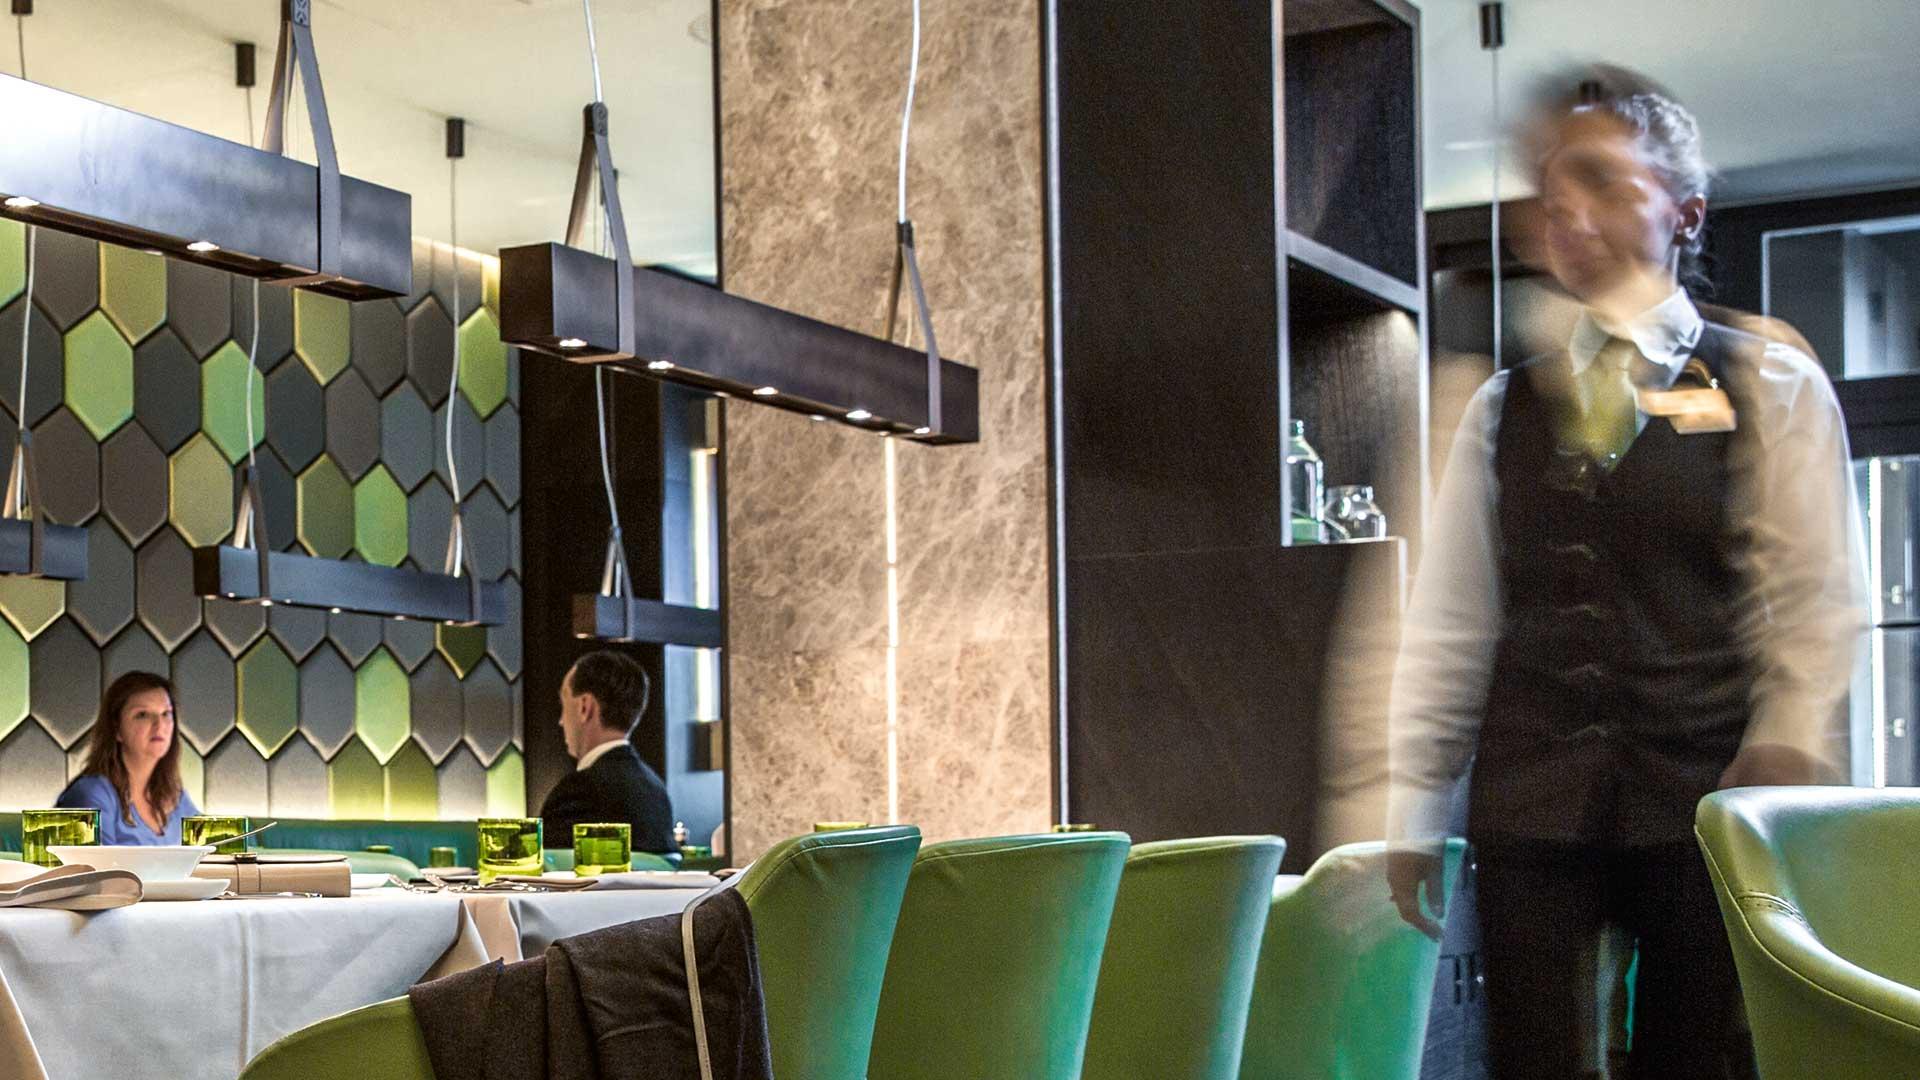 jobs dresden free agentur fr arbeit in dresden with jobs dresden stunning dresden partners. Black Bedroom Furniture Sets. Home Design Ideas